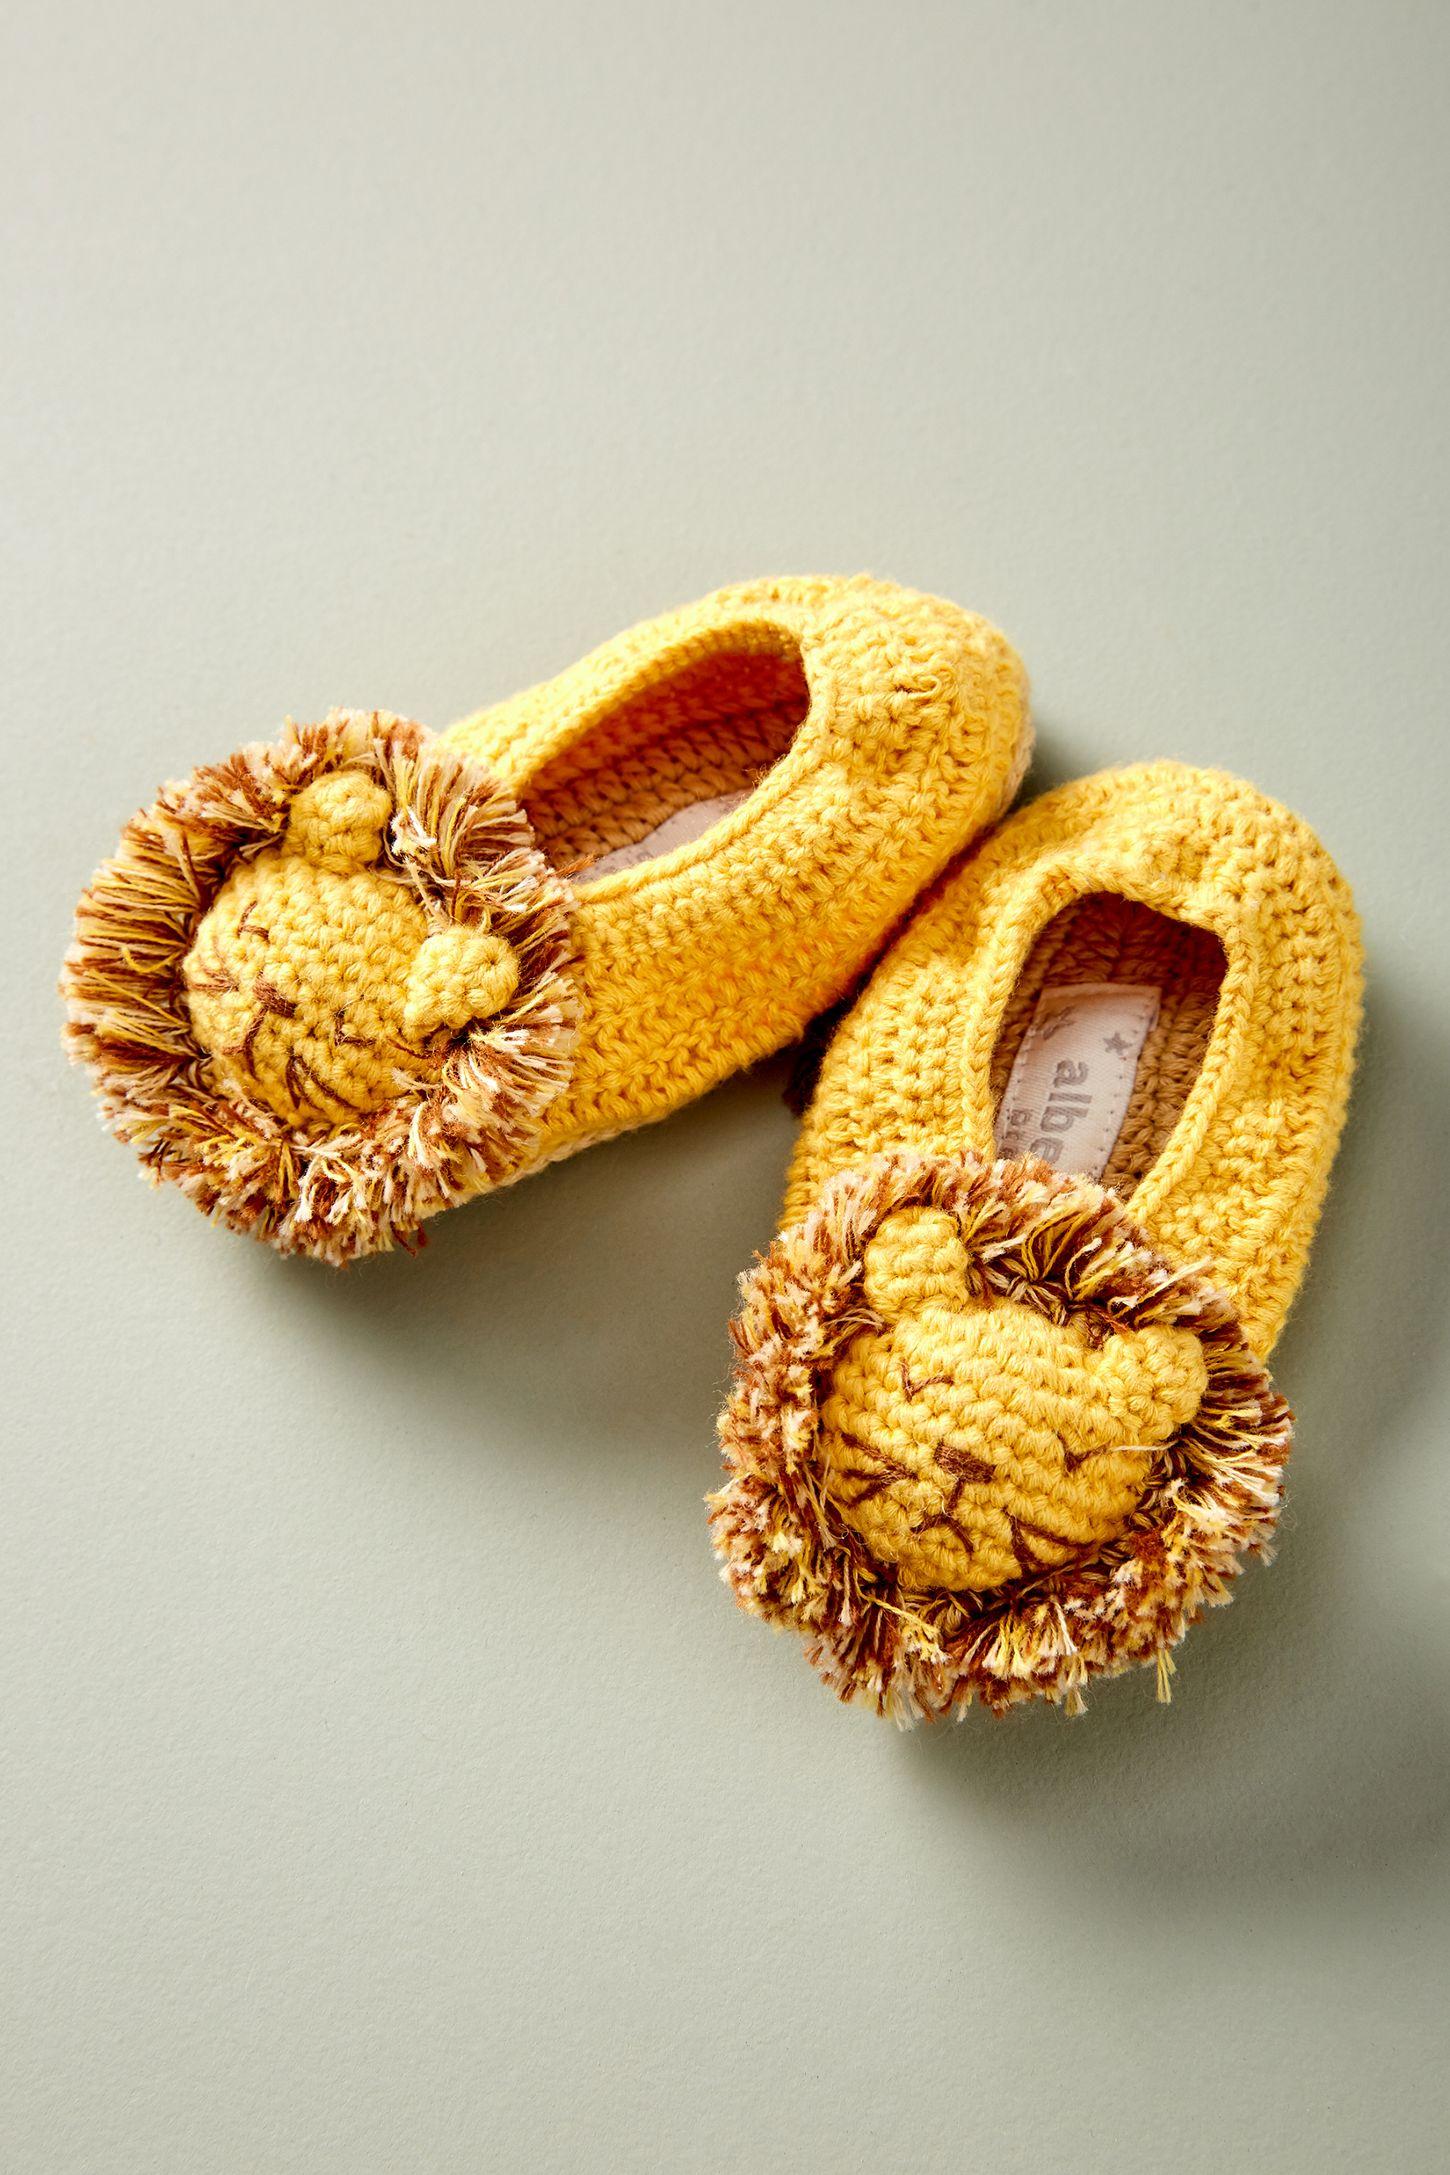 Crocheted Booties | Anthropologie